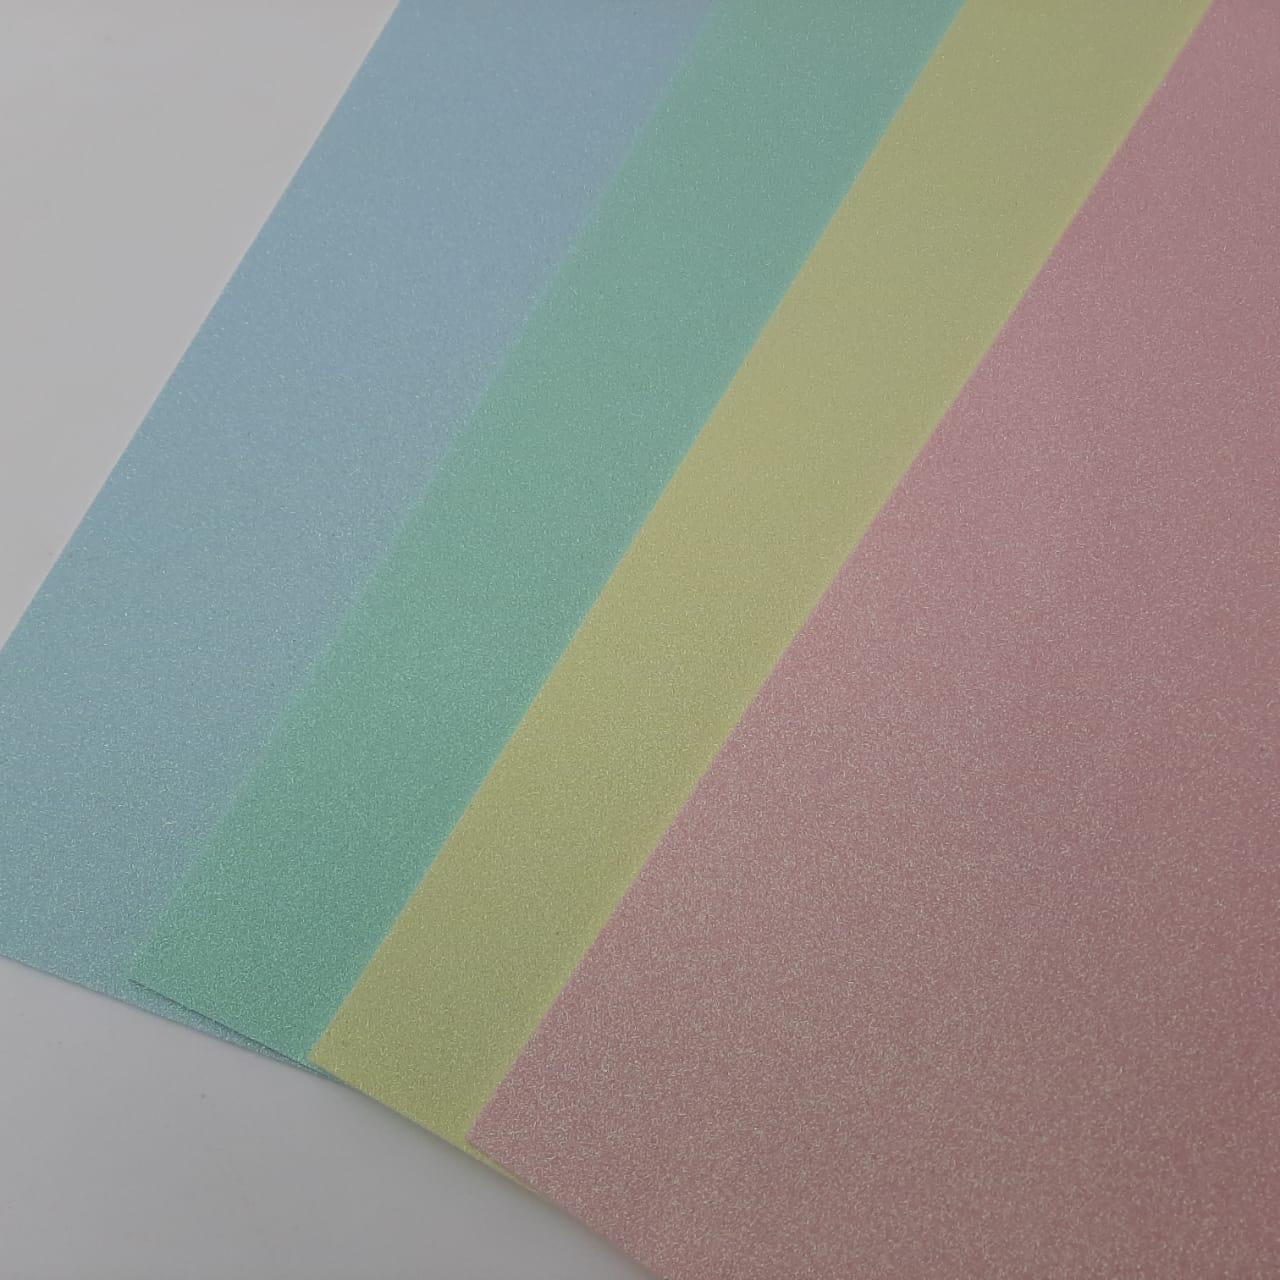 Combo de Eva Glitter Candy Premium  - 04 Folhas